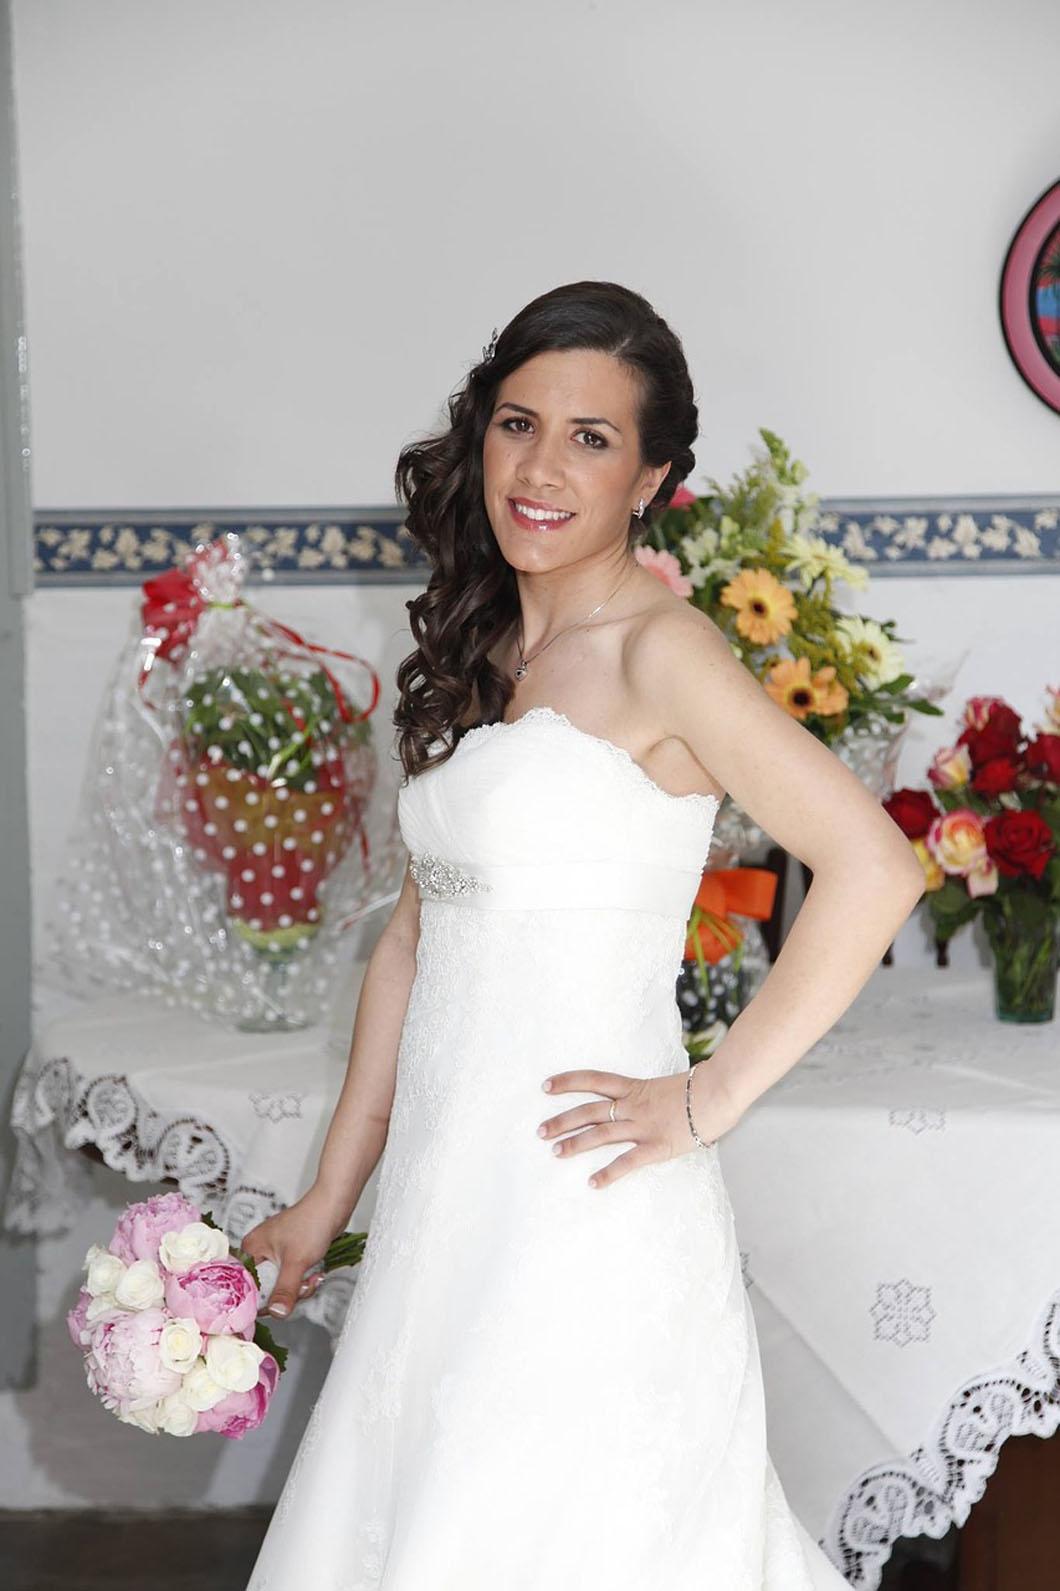 wedding-964807_1280